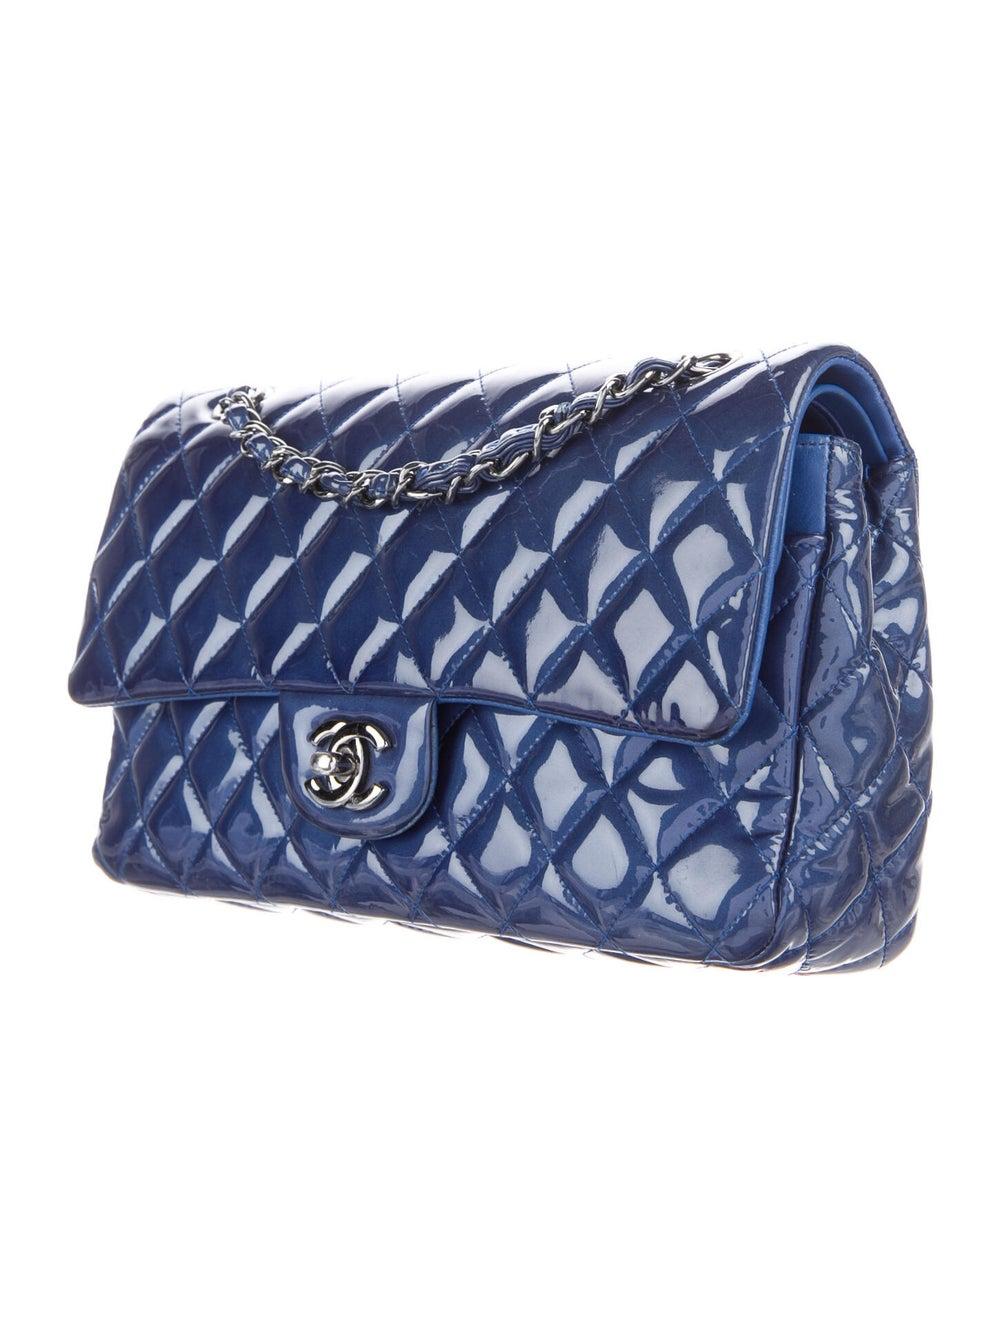 Chanel Medium Patent Flap Bag Blue - image 3